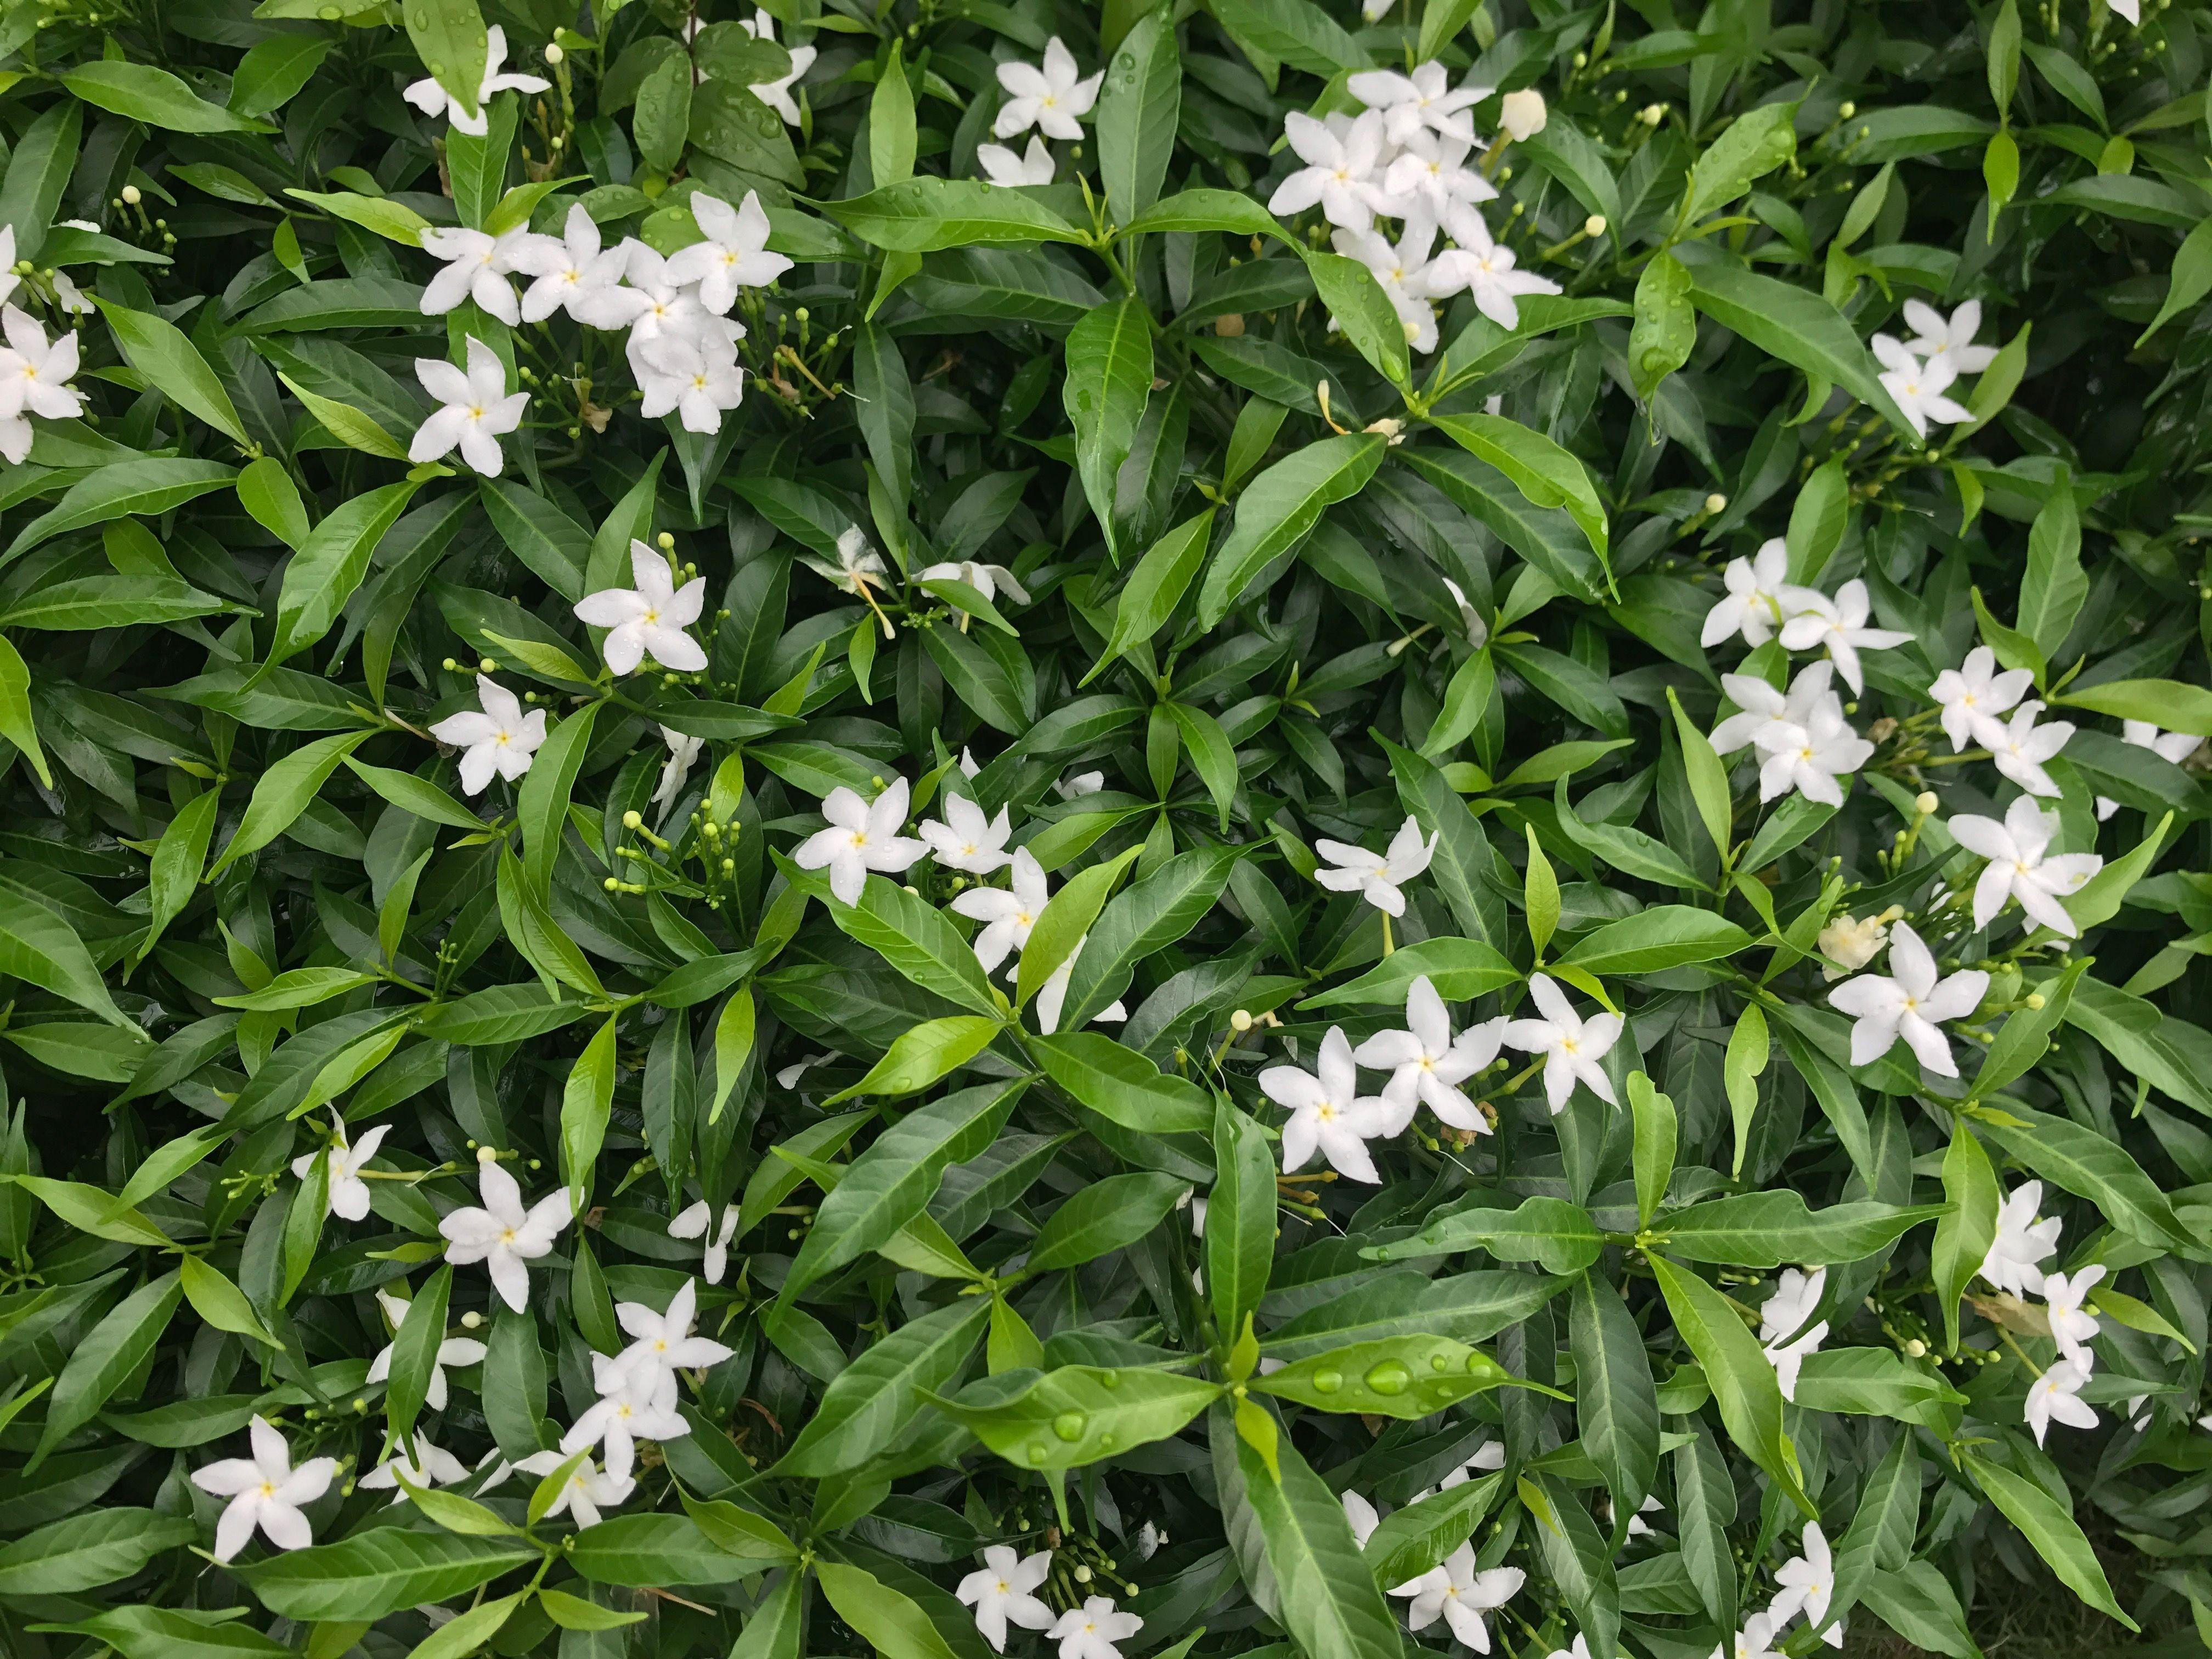 Thai Flowers Name Is Phutpitchaya White Flower Garden Green